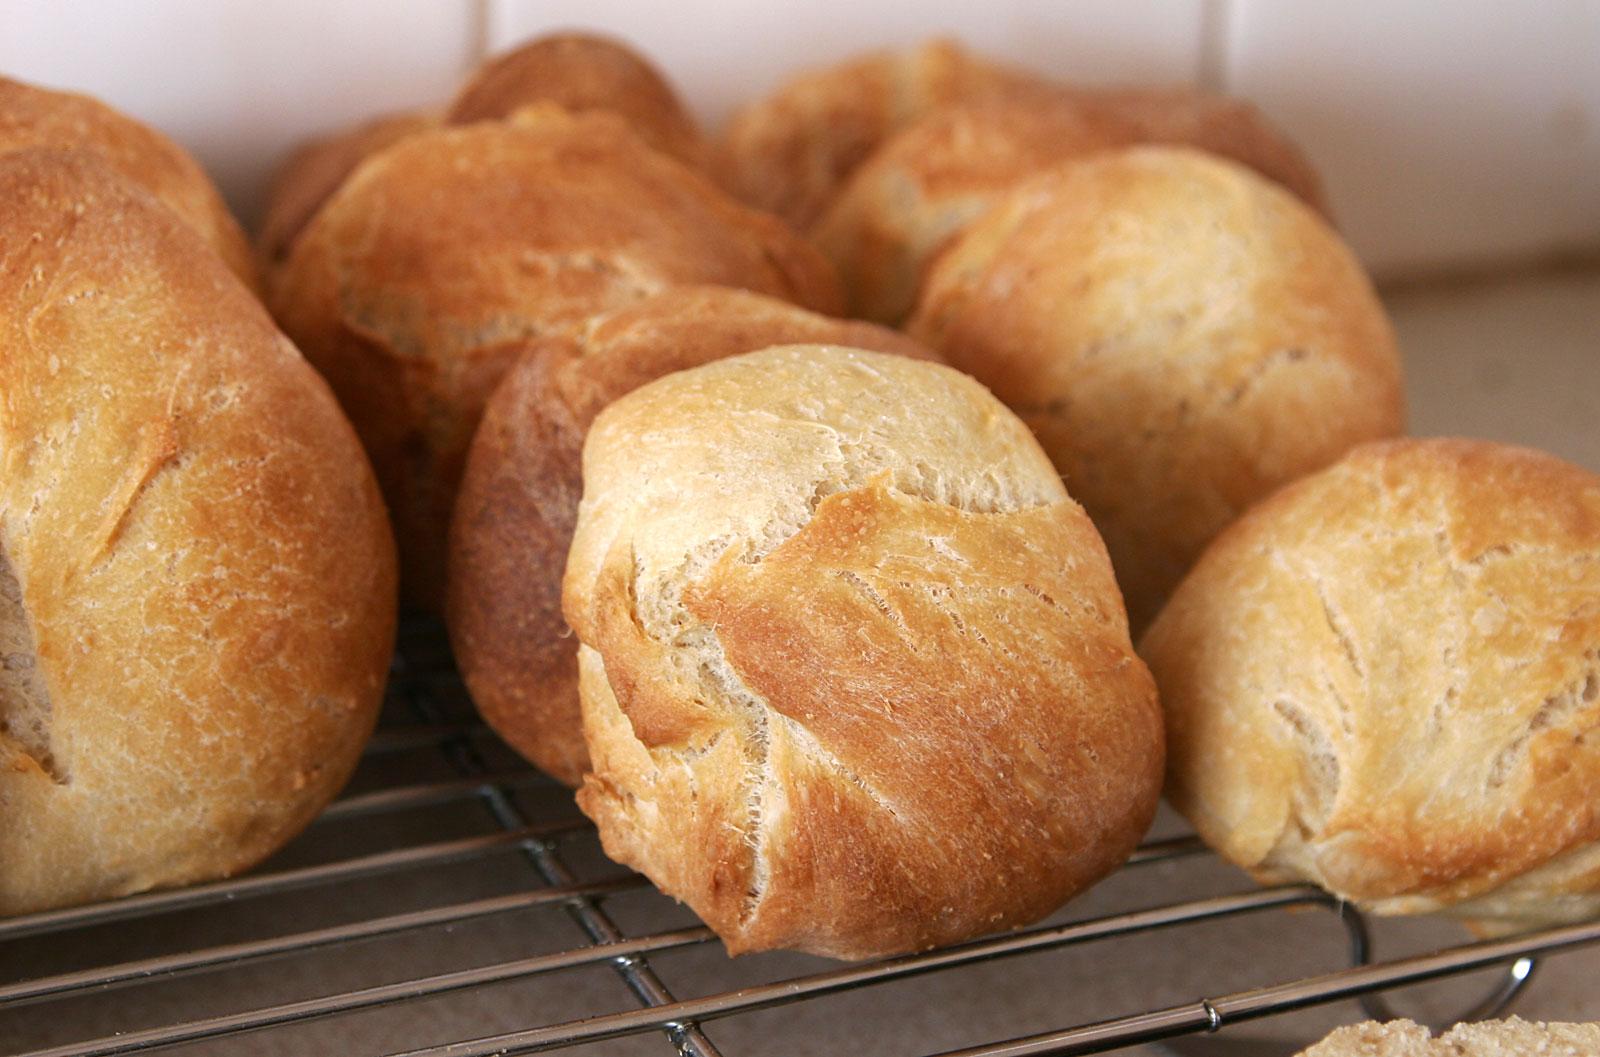 https://upload.wikimedia.org/wikipedia/commons/6/61/Bread_rolls.jpg